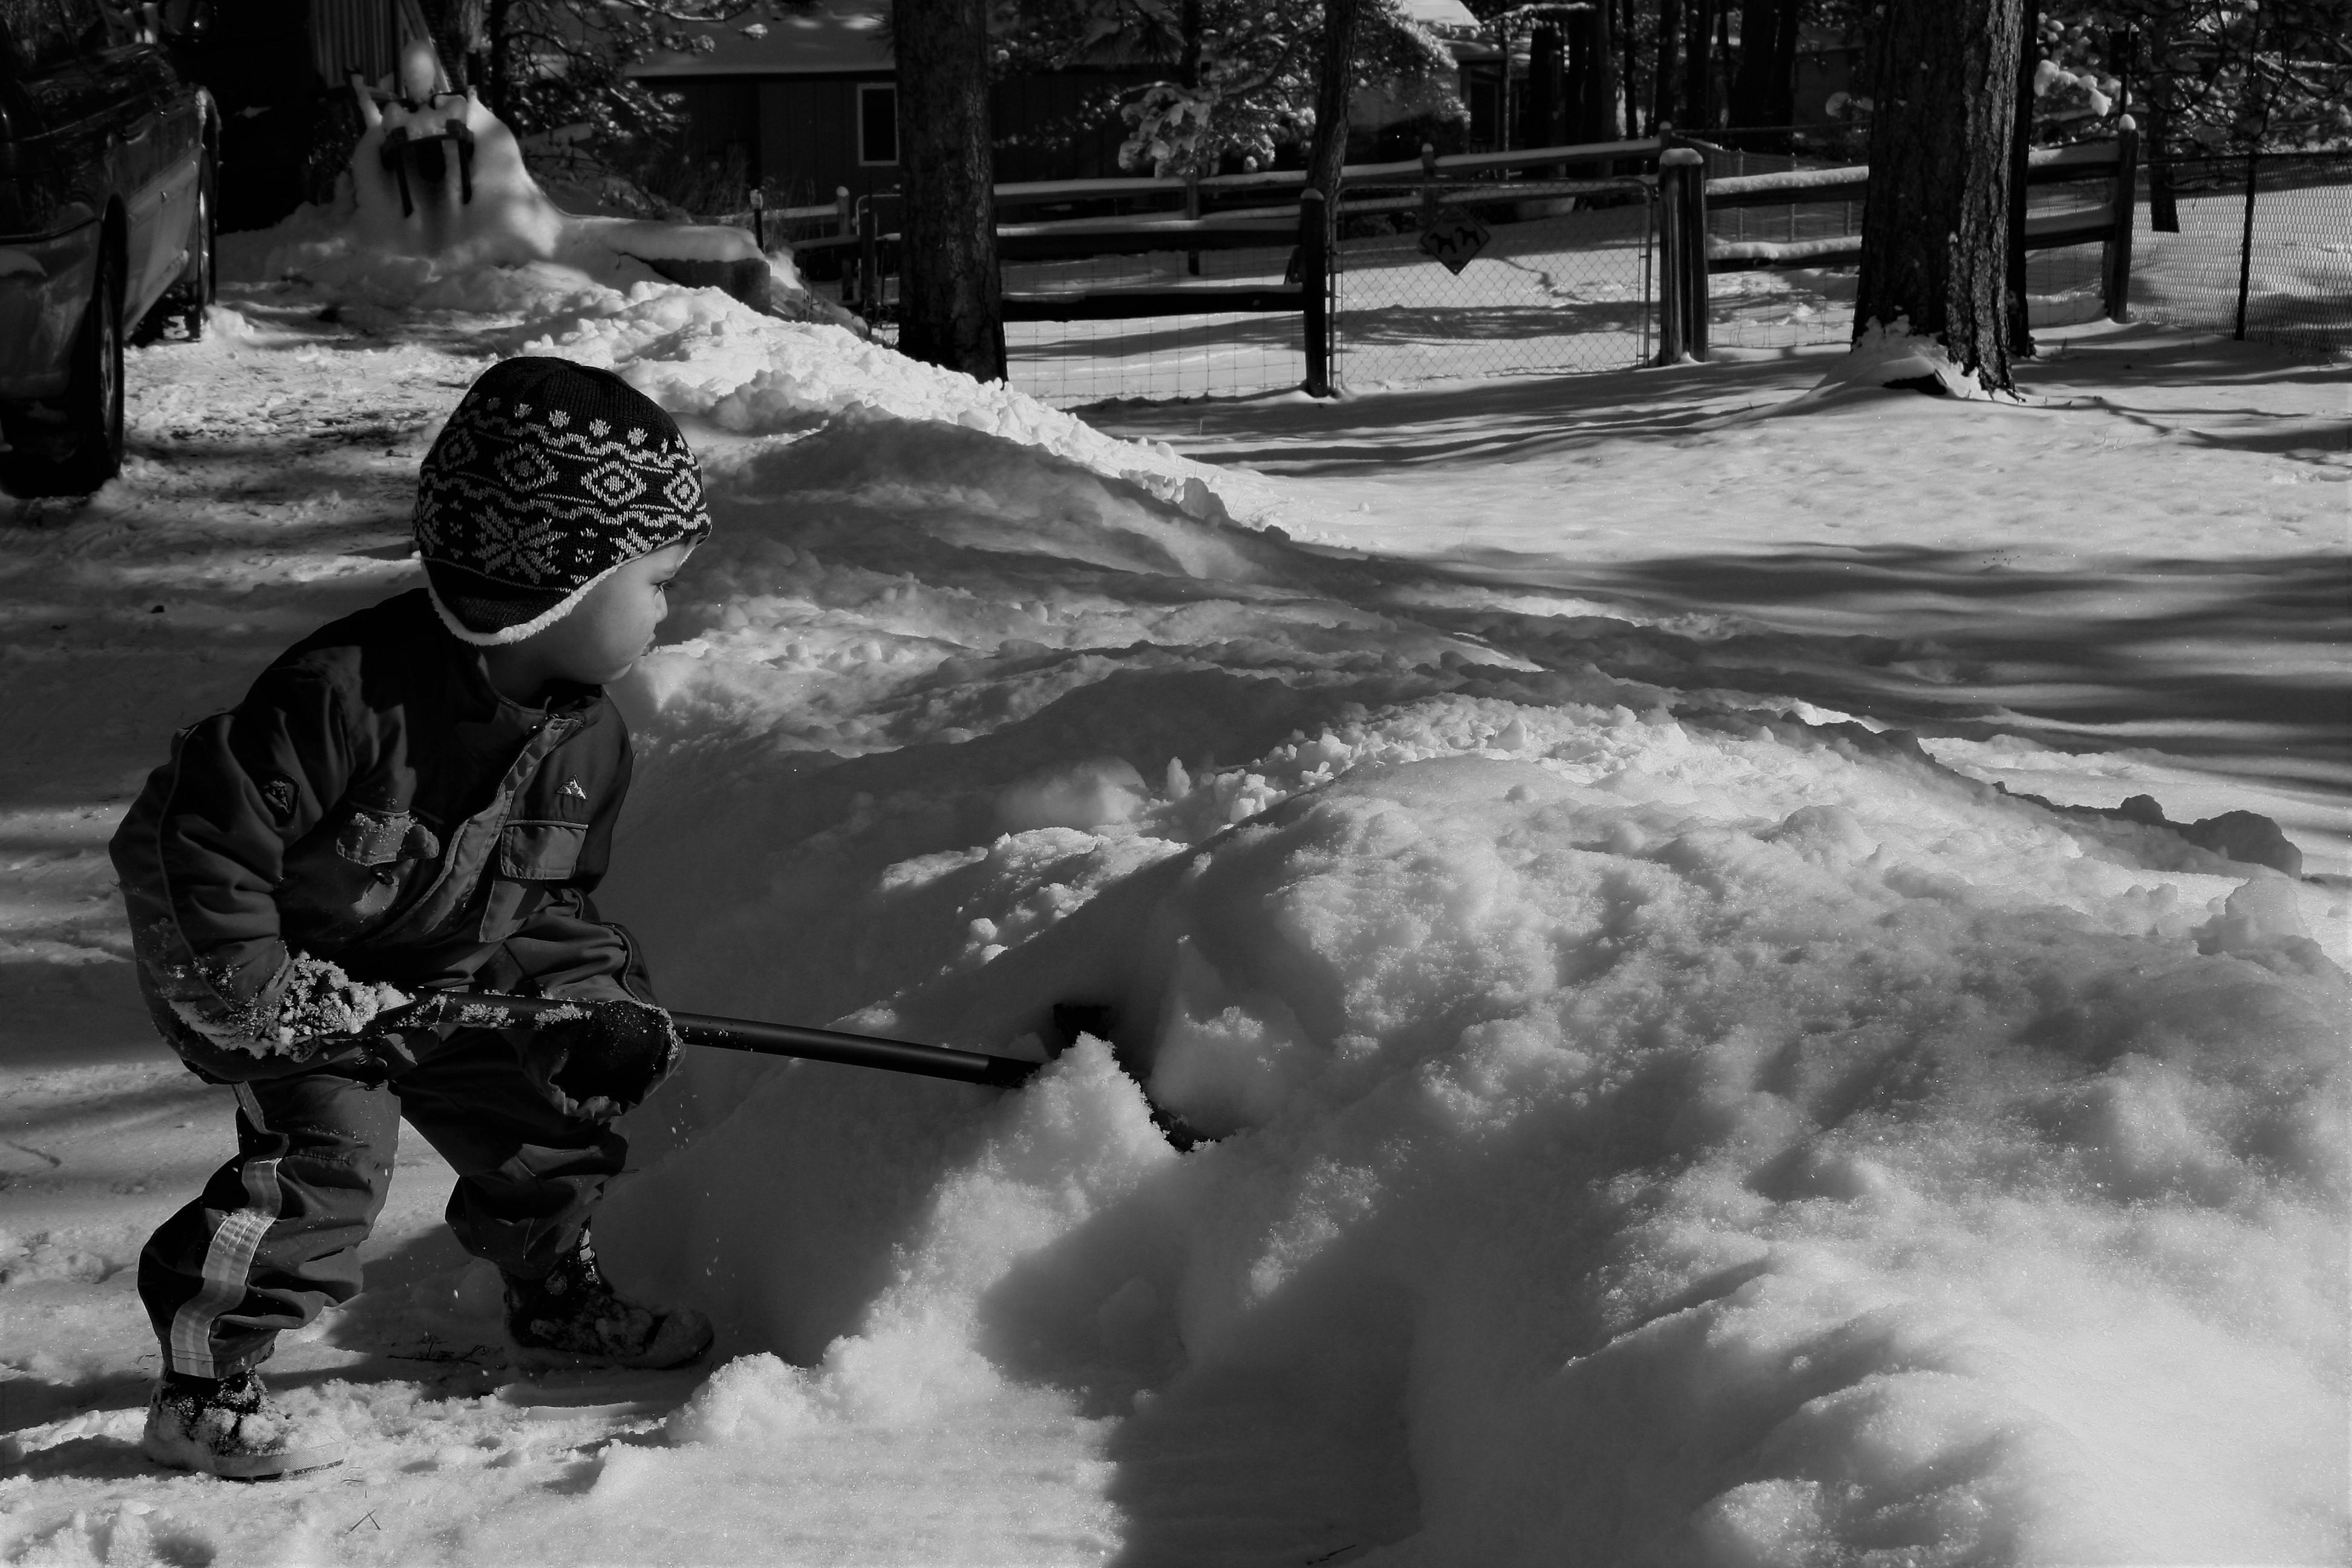 Kid-shoveling-snow